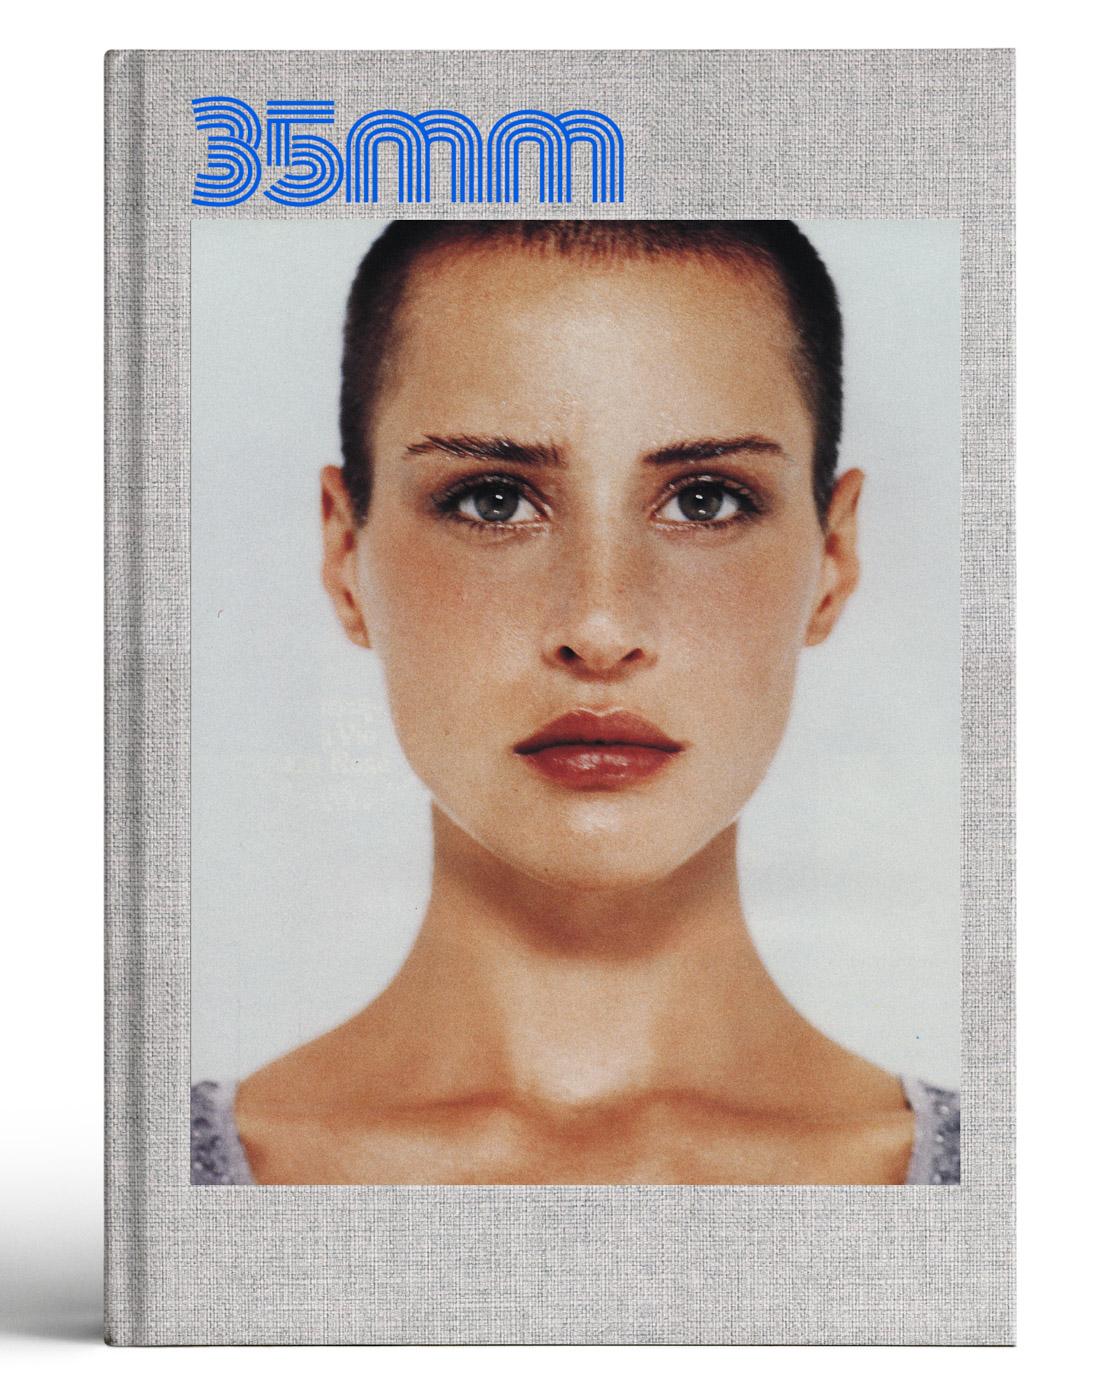 35mm_magazine_book_issue_film_only08.jpg